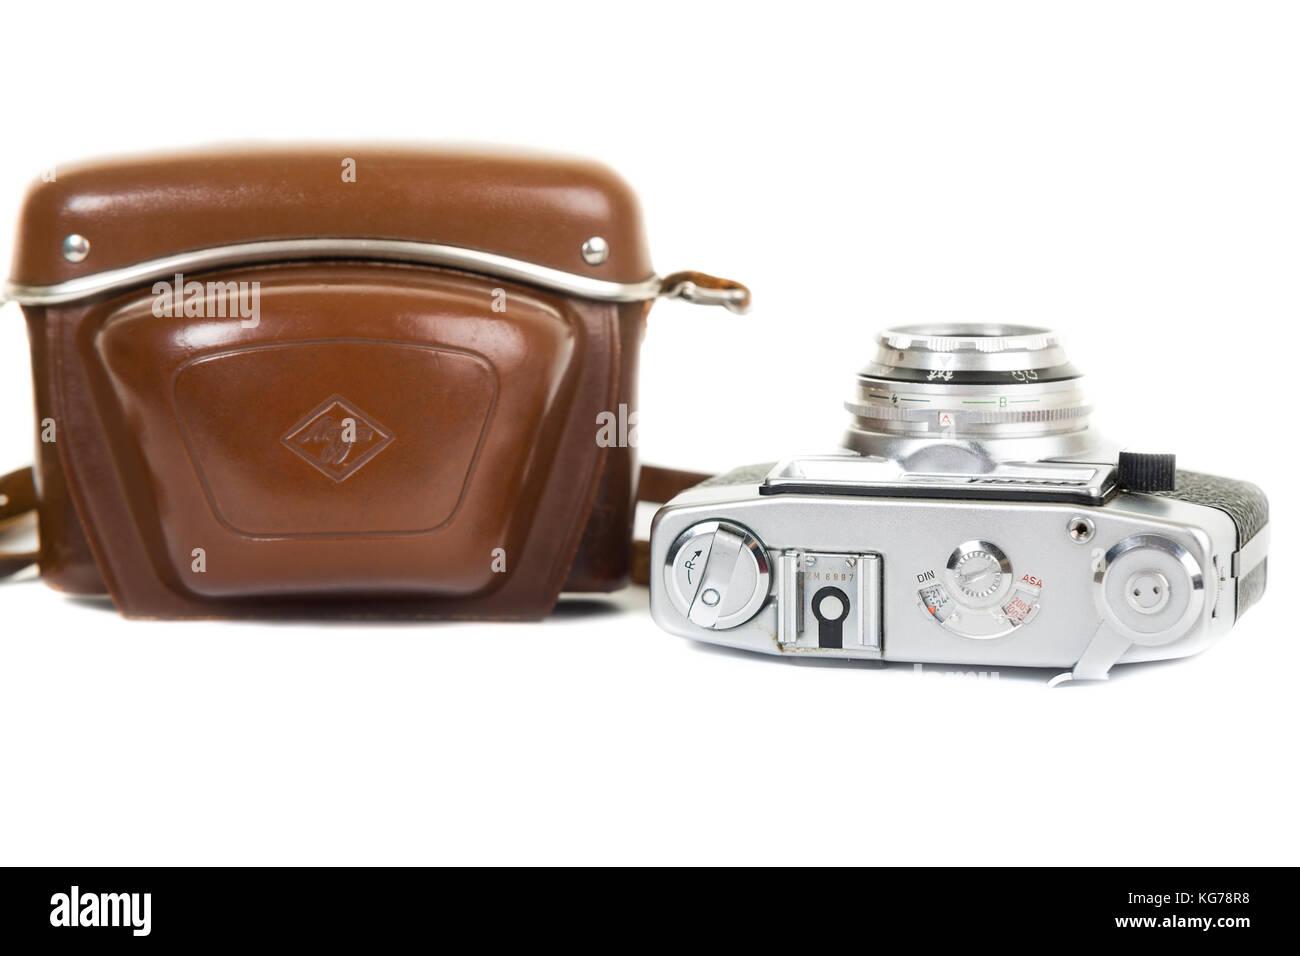 Vintage Agfa analogue camera and leather case isolated on white background - Stock Image